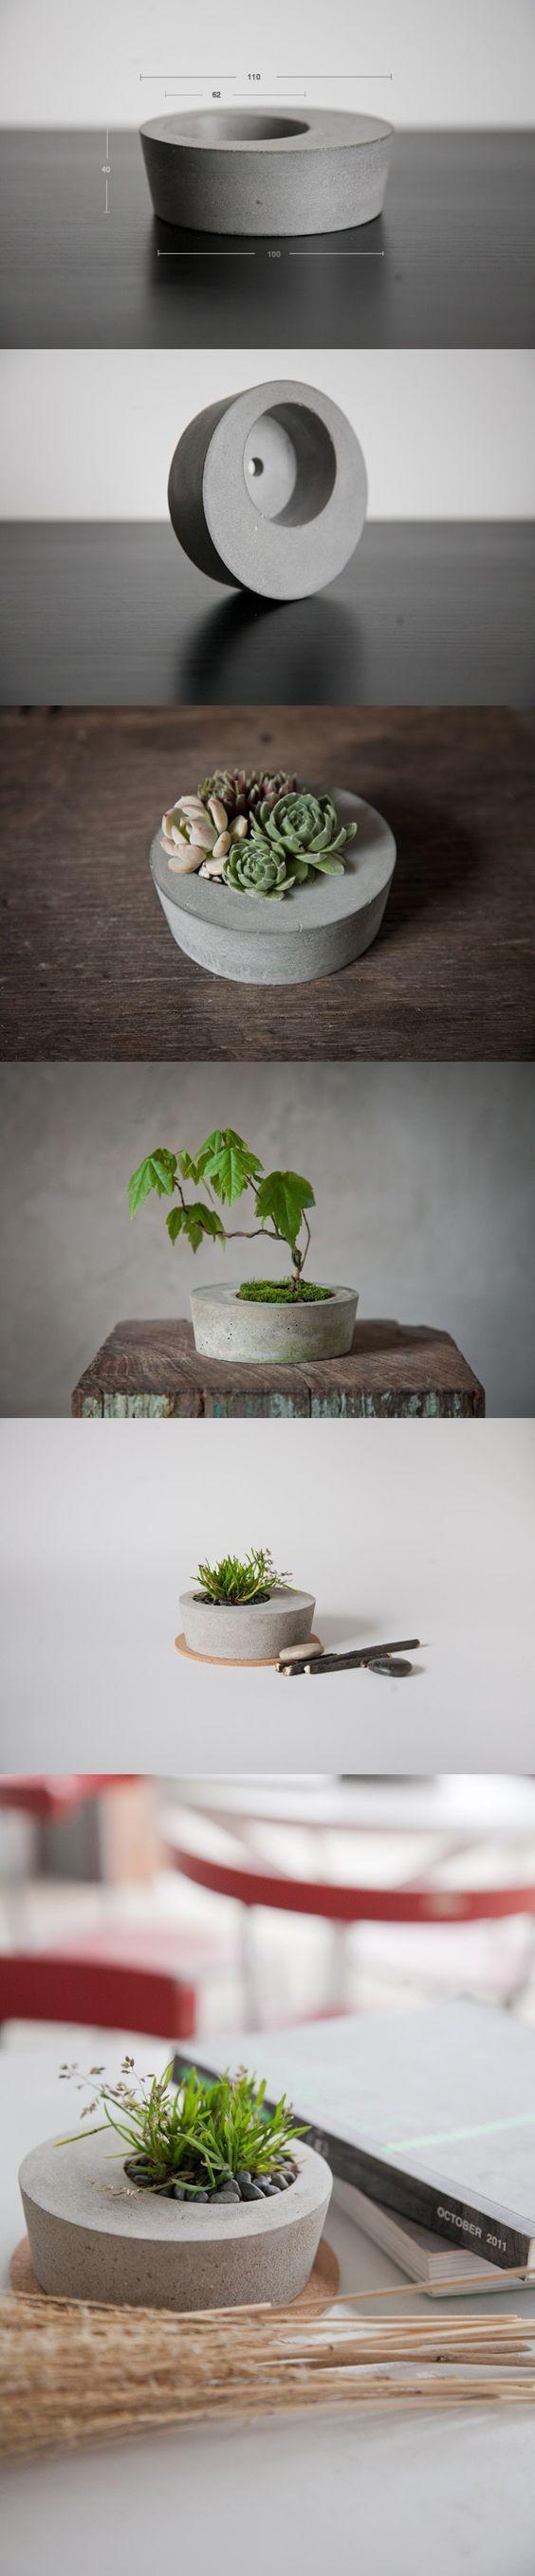 DIY: Concrete planter: